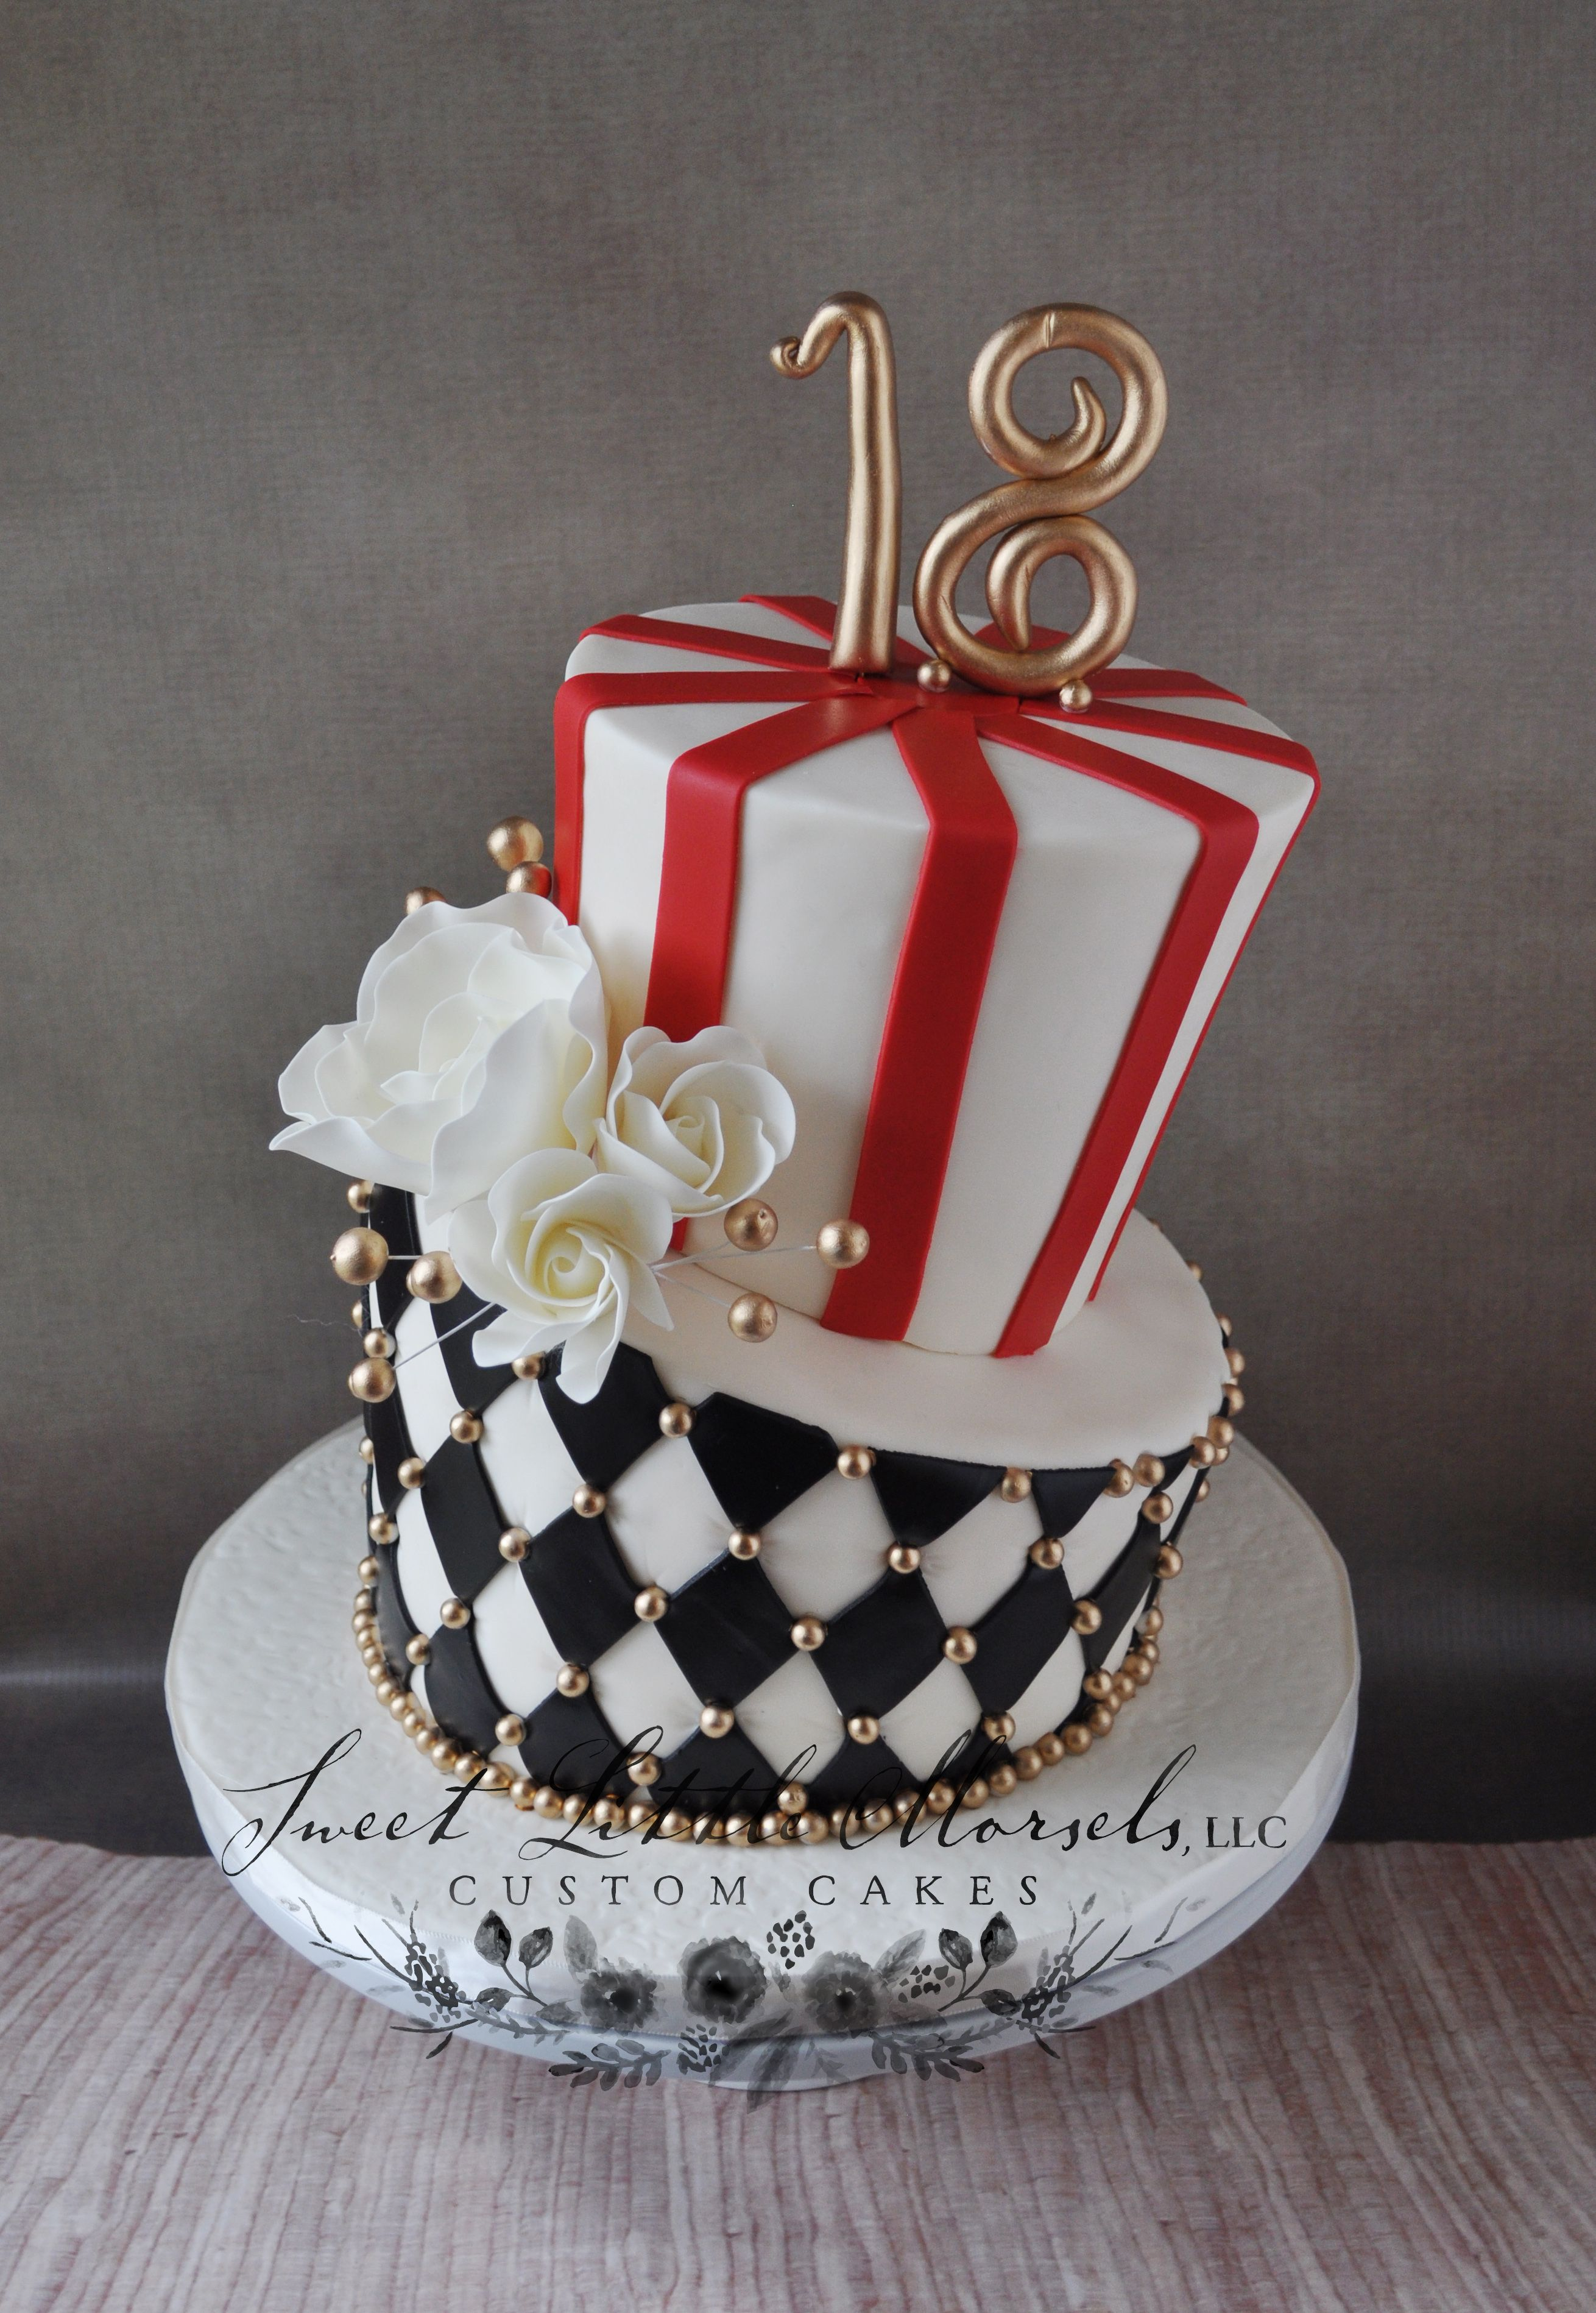 Vintage Circus Theme Topsy Turvy Cake 18th Birthday Cake Cakes